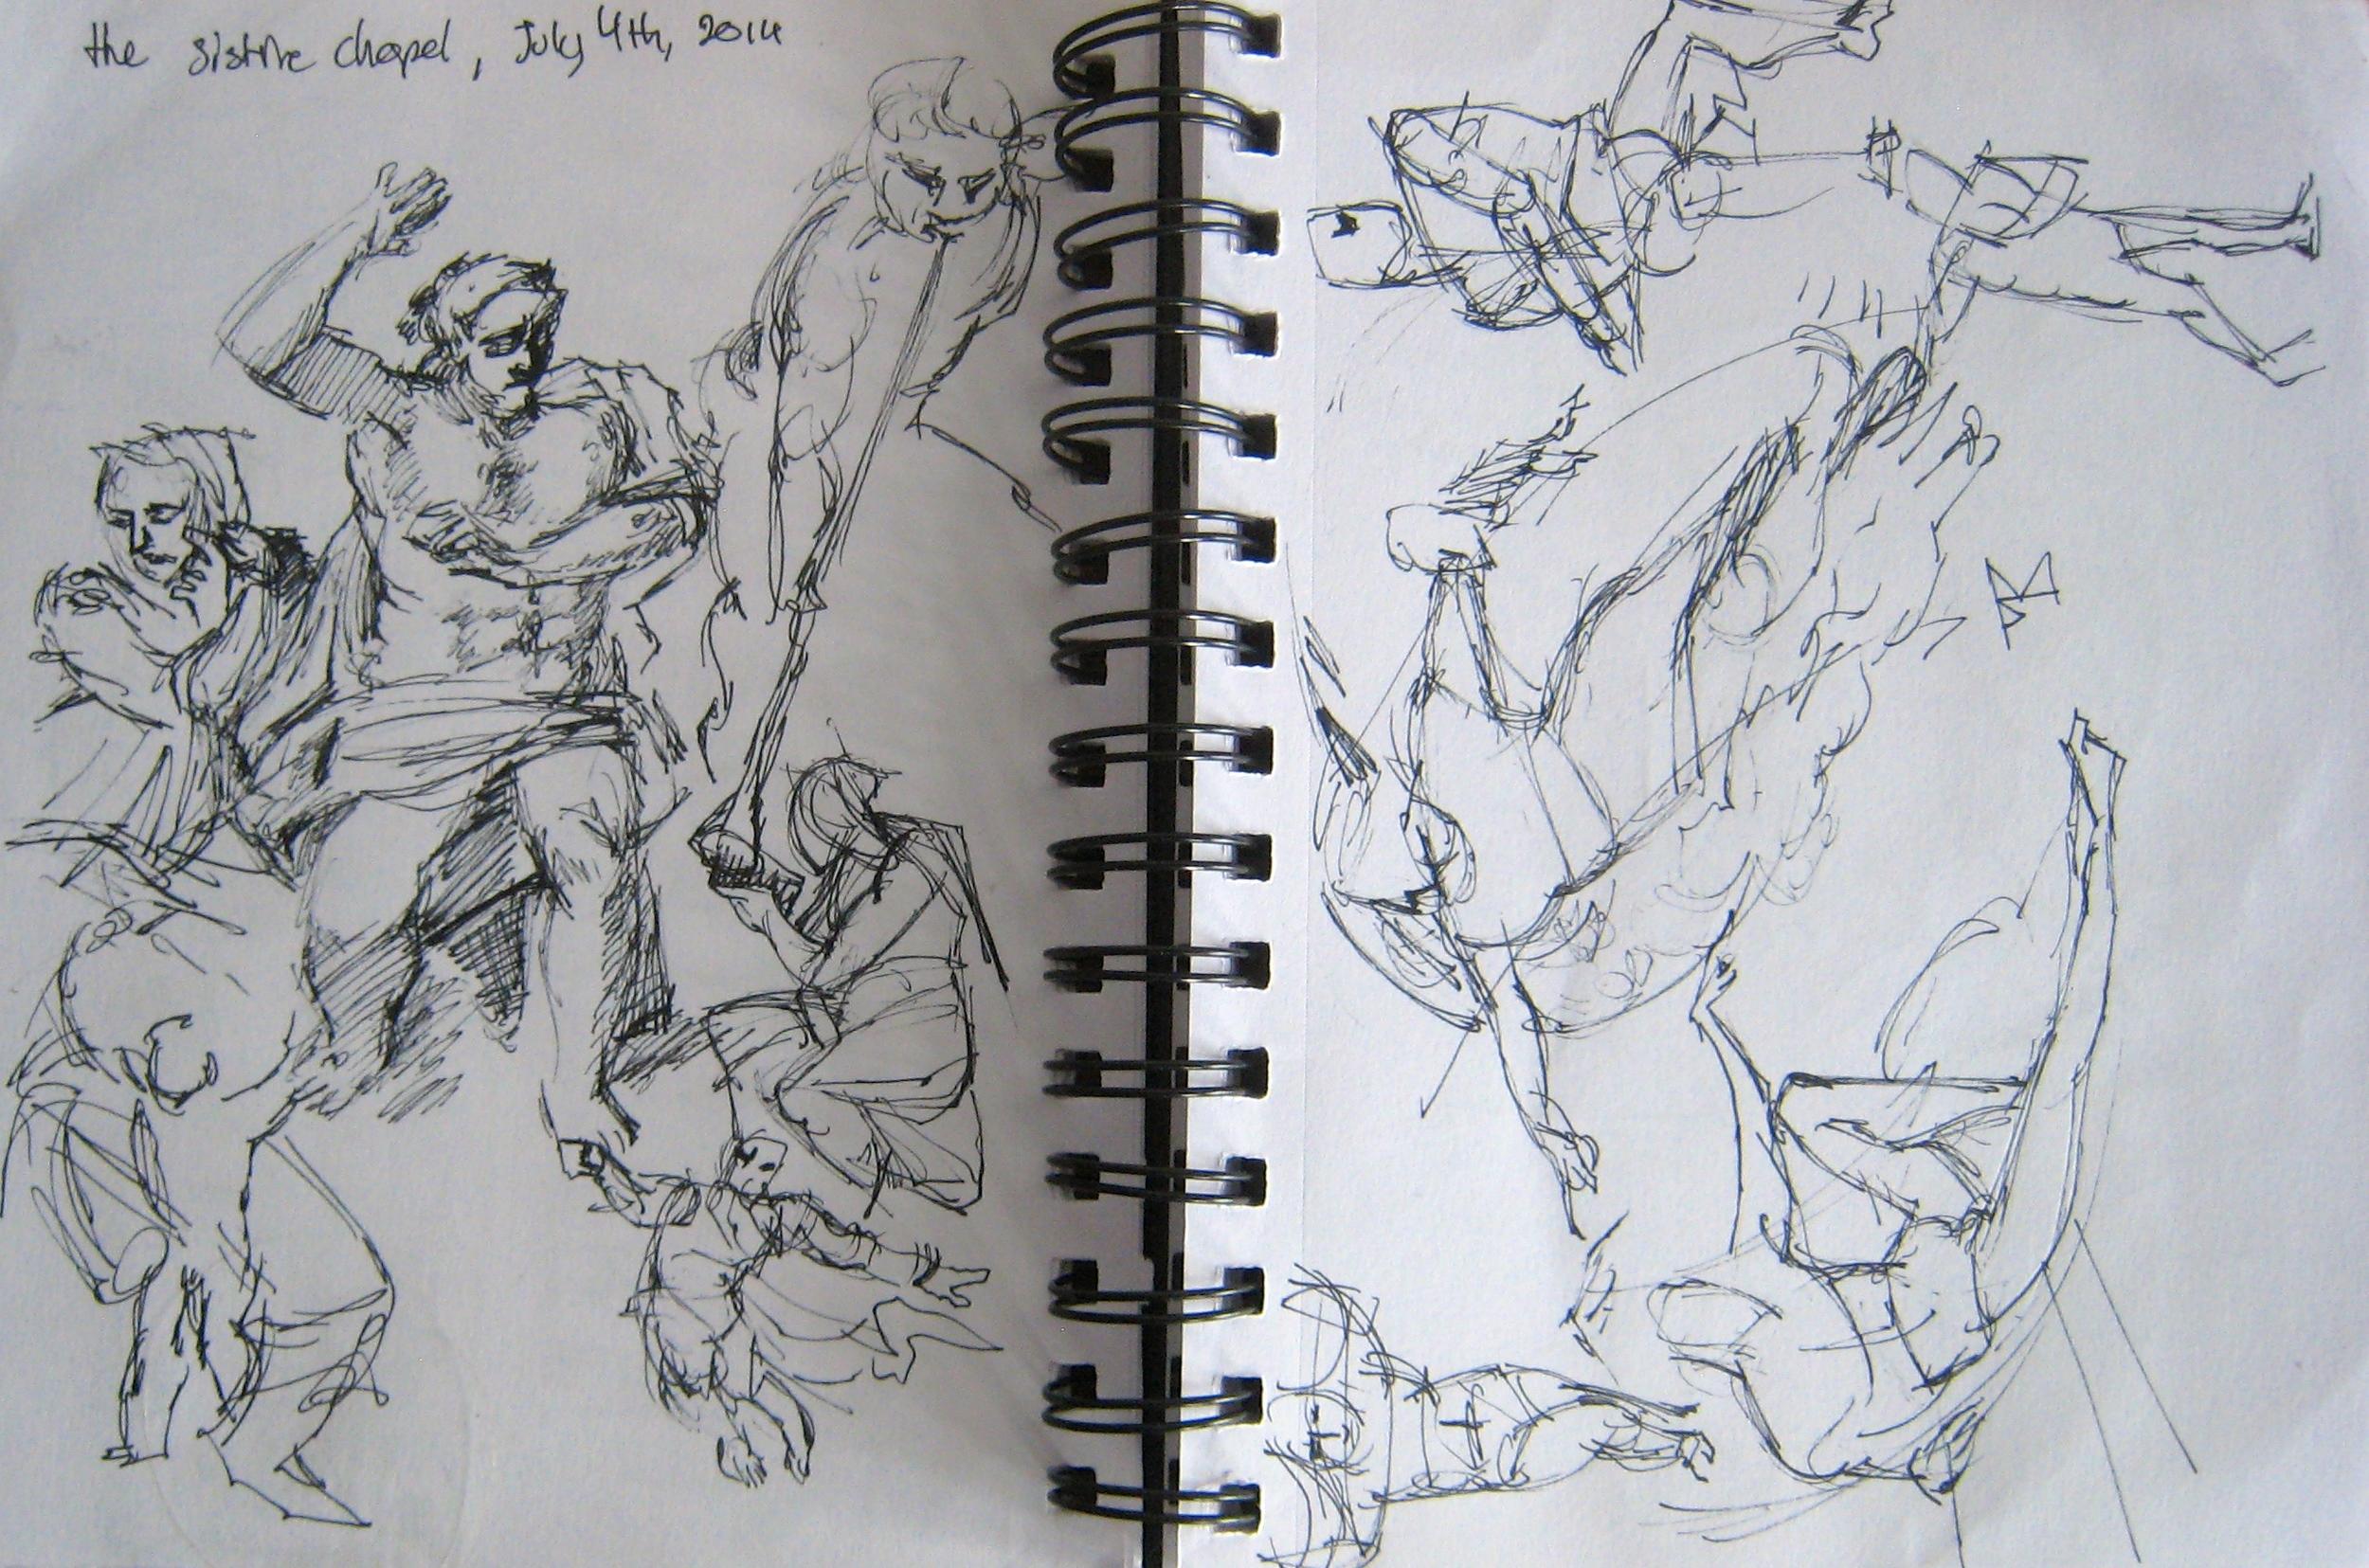 Megan Kelchner,  The Sistine Chapel, July 4, 2014 ,pen sketch, 2014